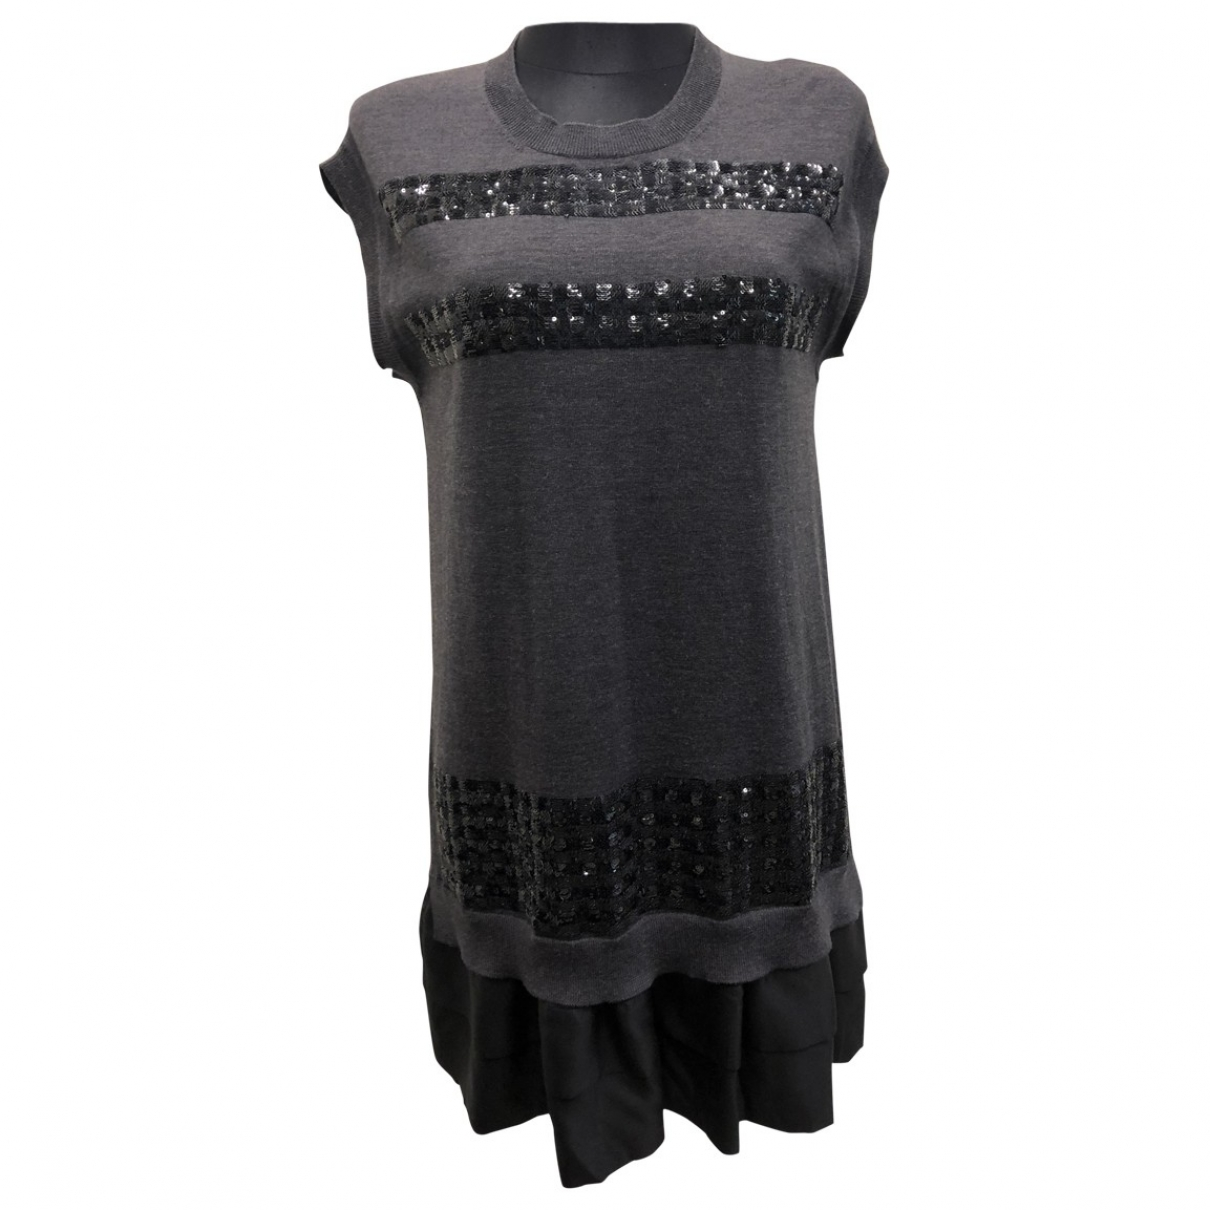 Louis Vuitton \N Grey Wool dress for Women S International